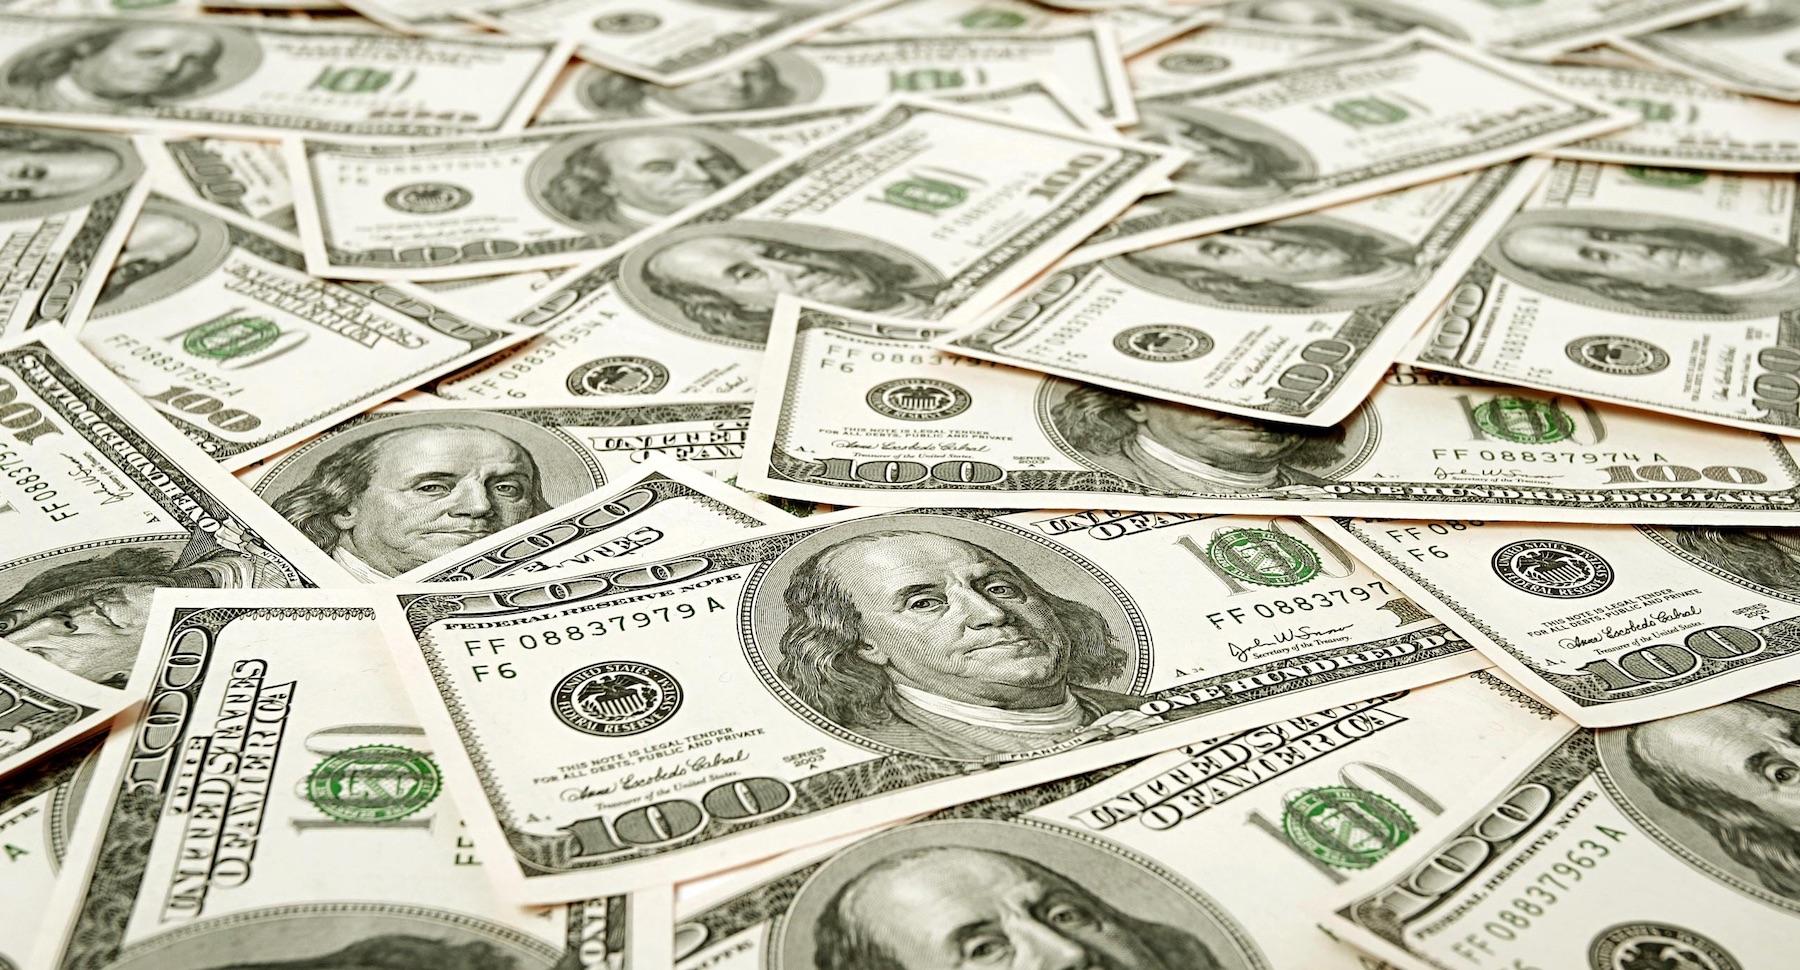 dollars | Econ Alerts